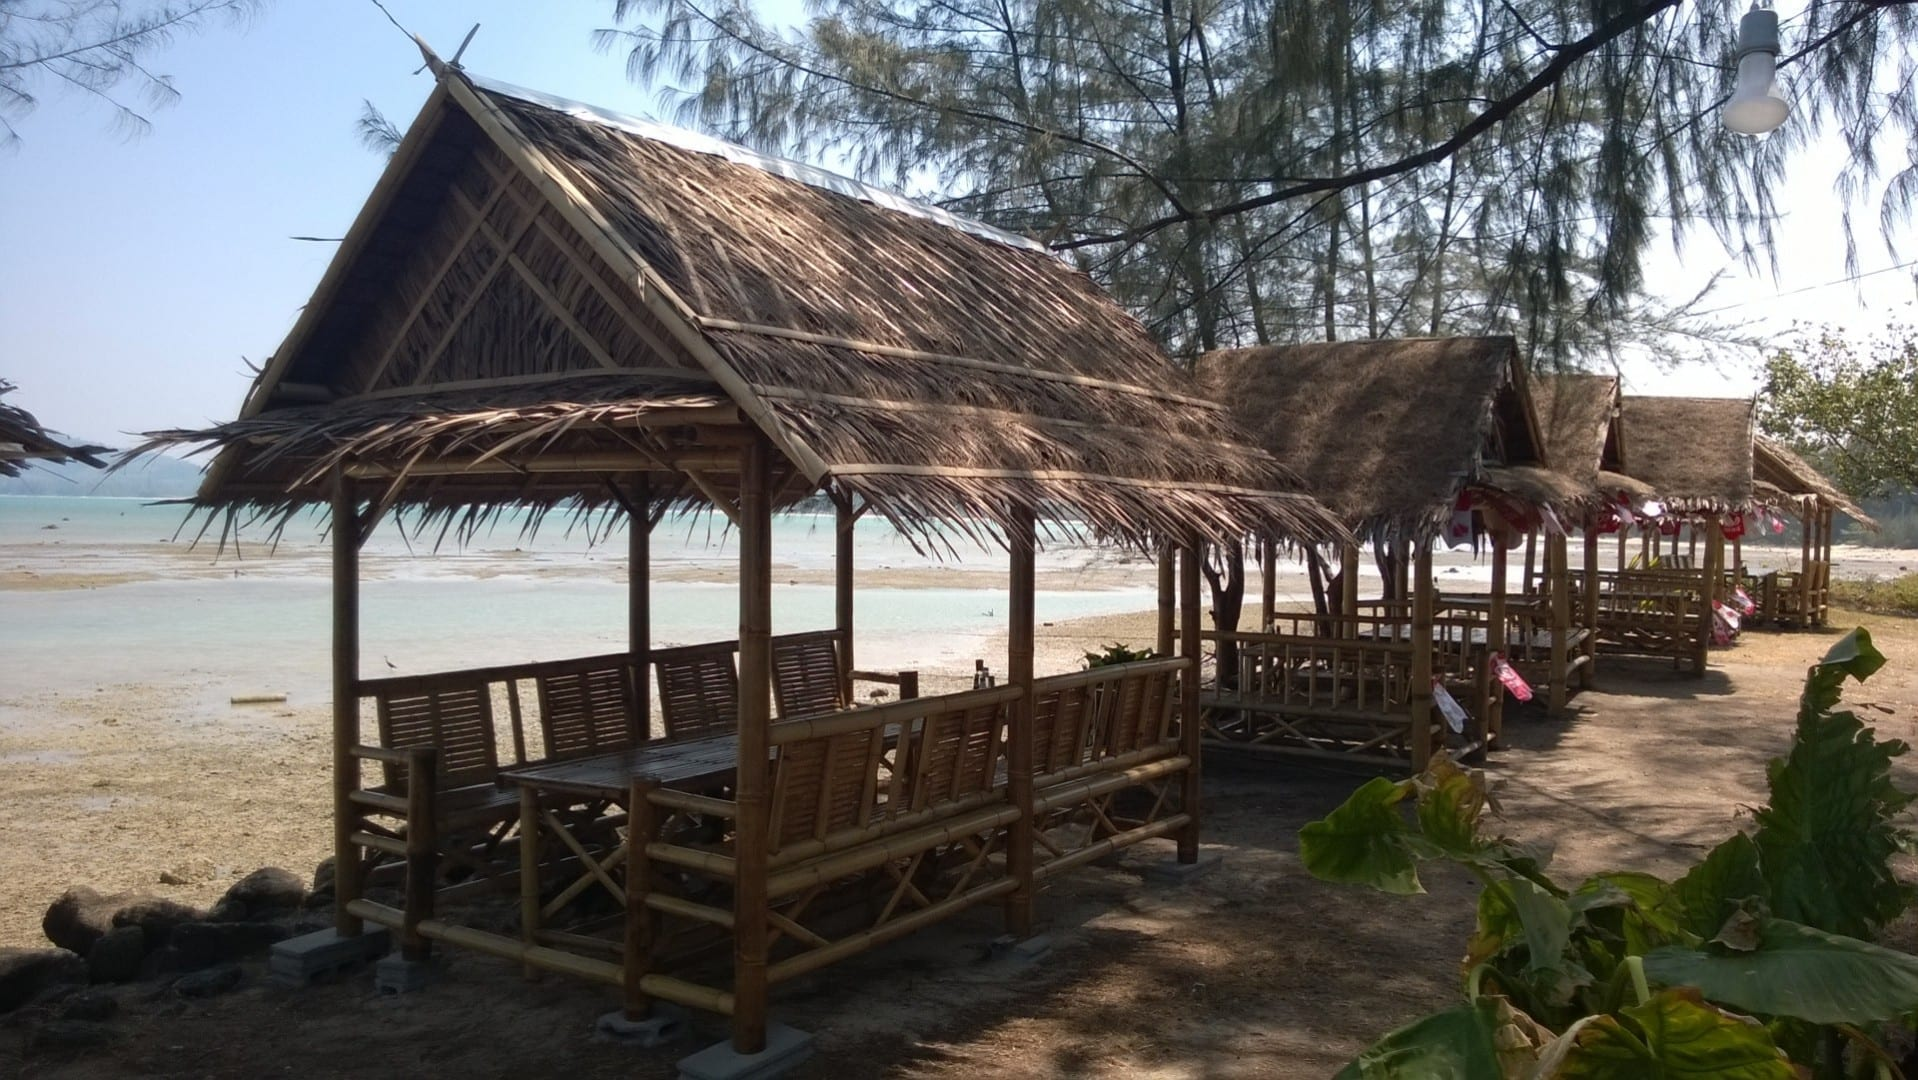 Las cabañas se alinean en la orilla de la playa Pakarang. Koh Kho Khao Tailandia